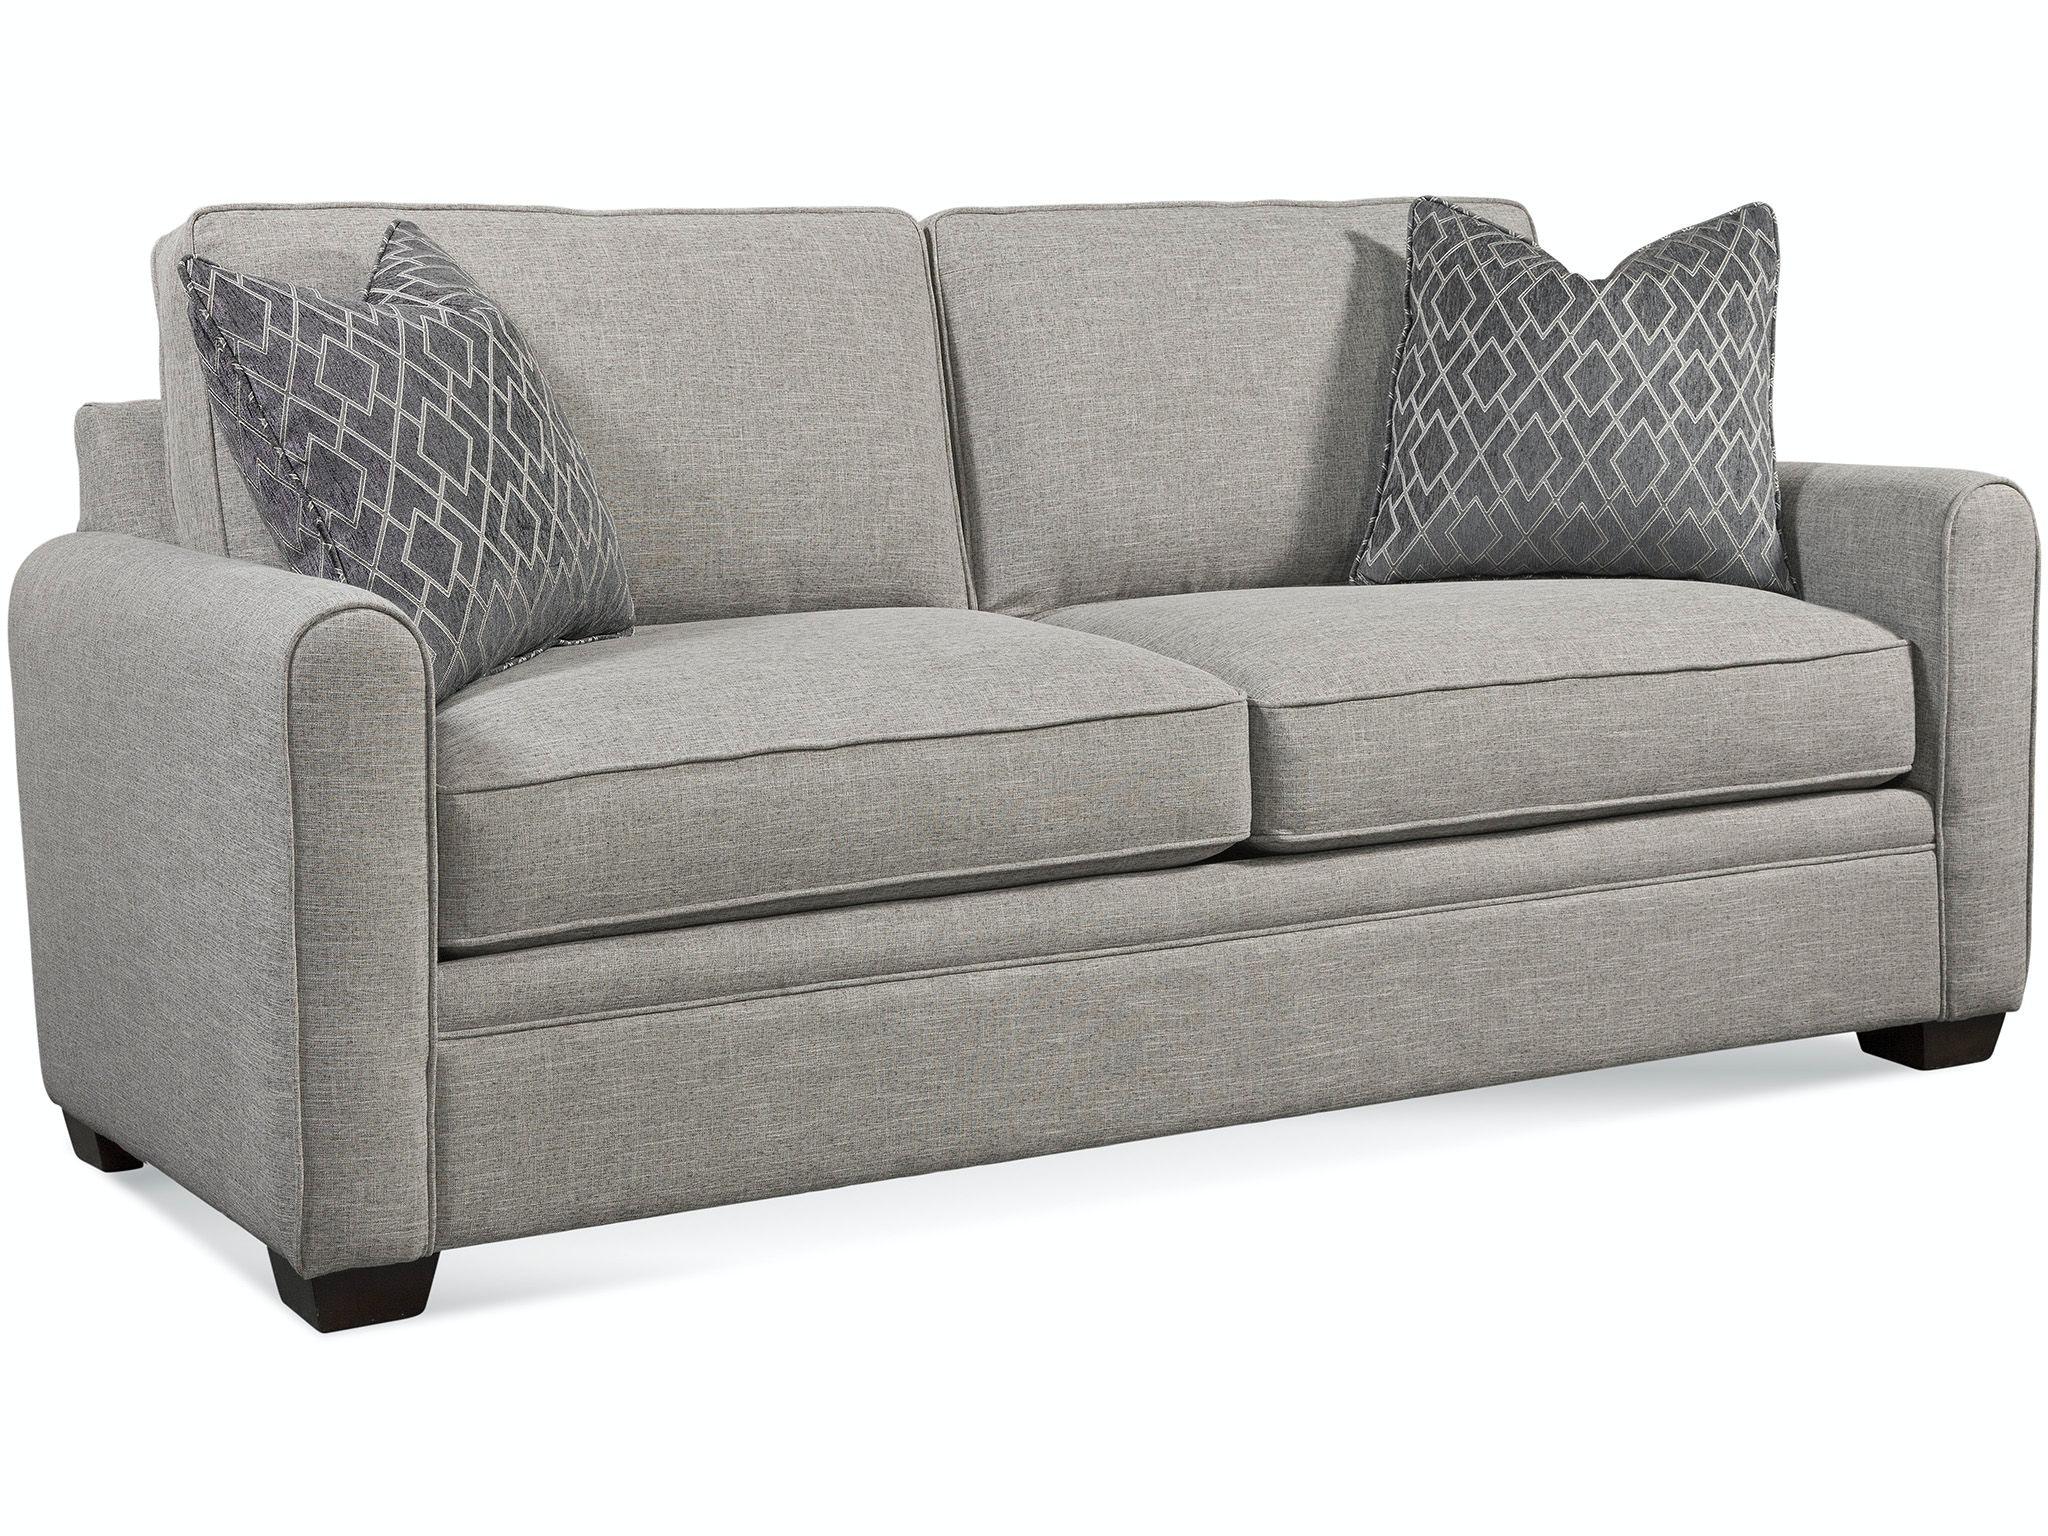 Braxton Culler Sofa 736 011